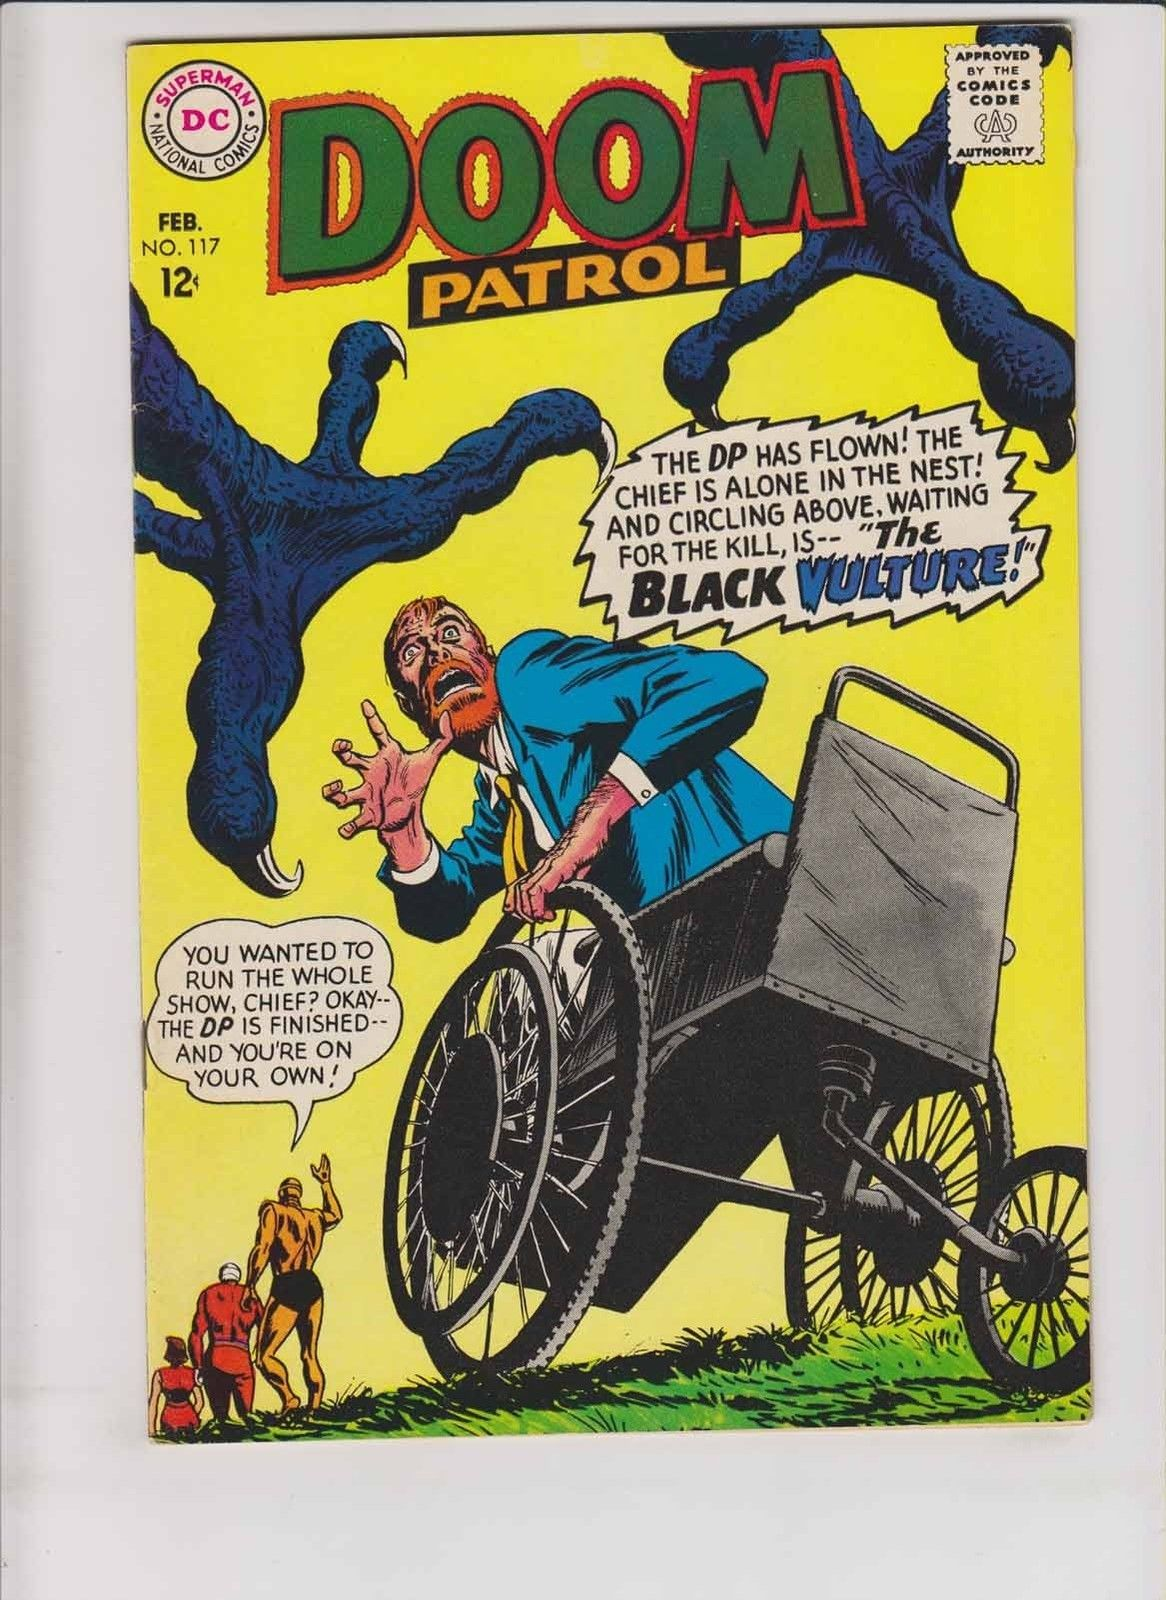 Doom Patrol 117 Vf February 1968 Black Vulture Silver Age Dc